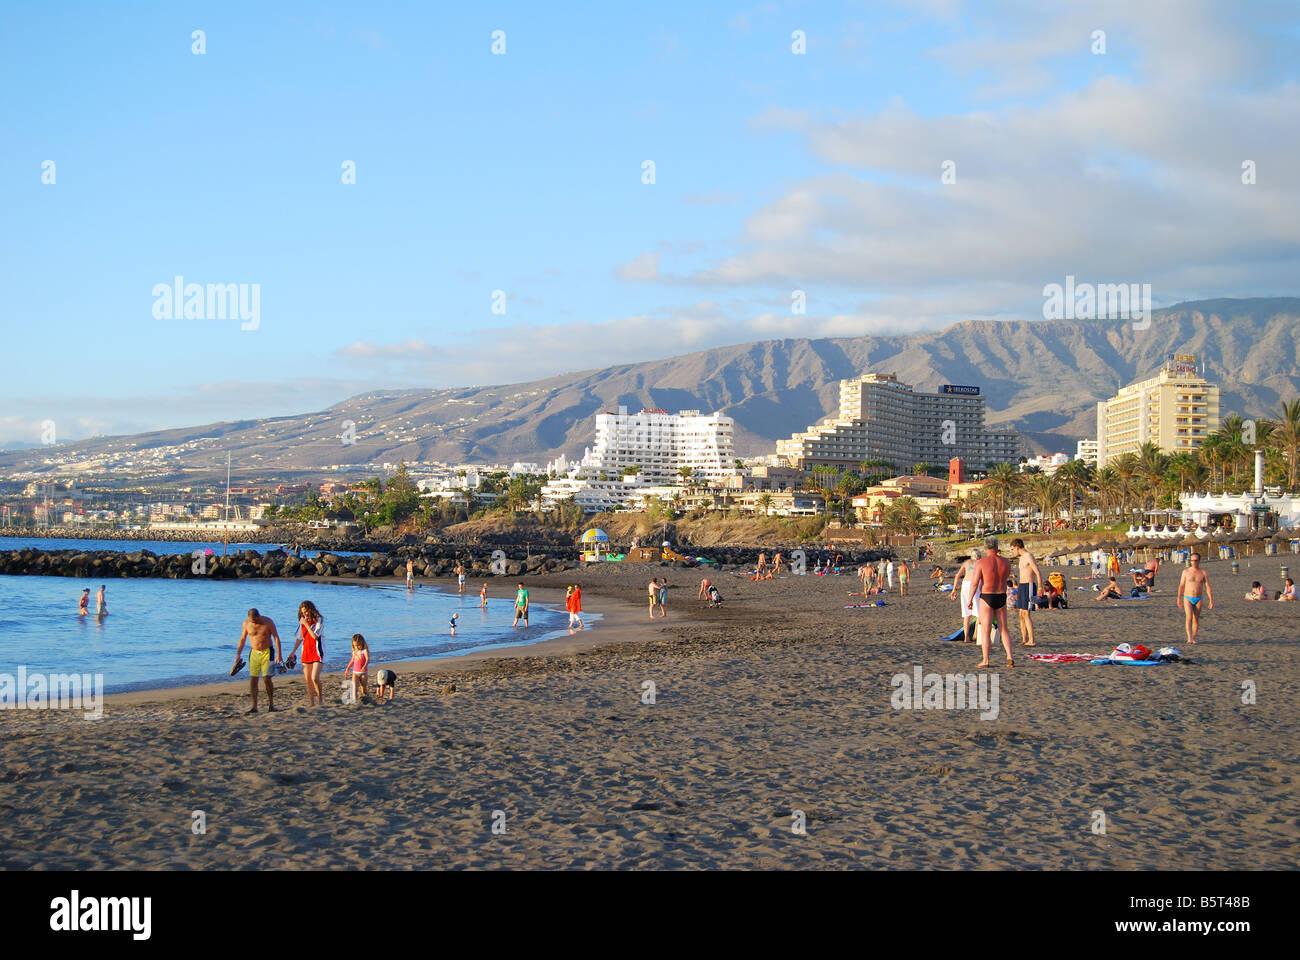 Playa Las Cuevitas at sunset, Playa de las Americas, Tenerife, Canary Islands, Spain Stock Photo